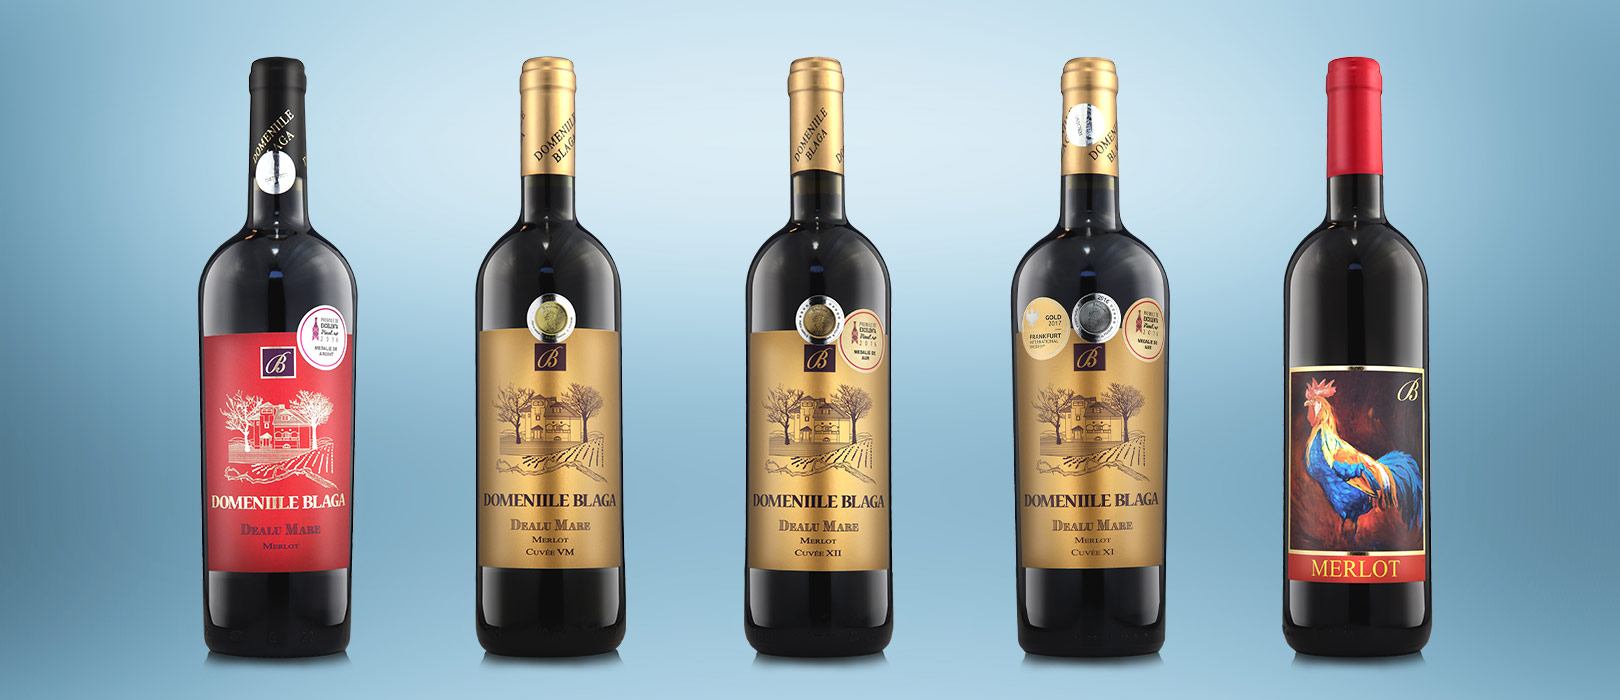 Merlot Vin Rosu Domeniile Blaga Cumpara Vin Online Vin Rosu